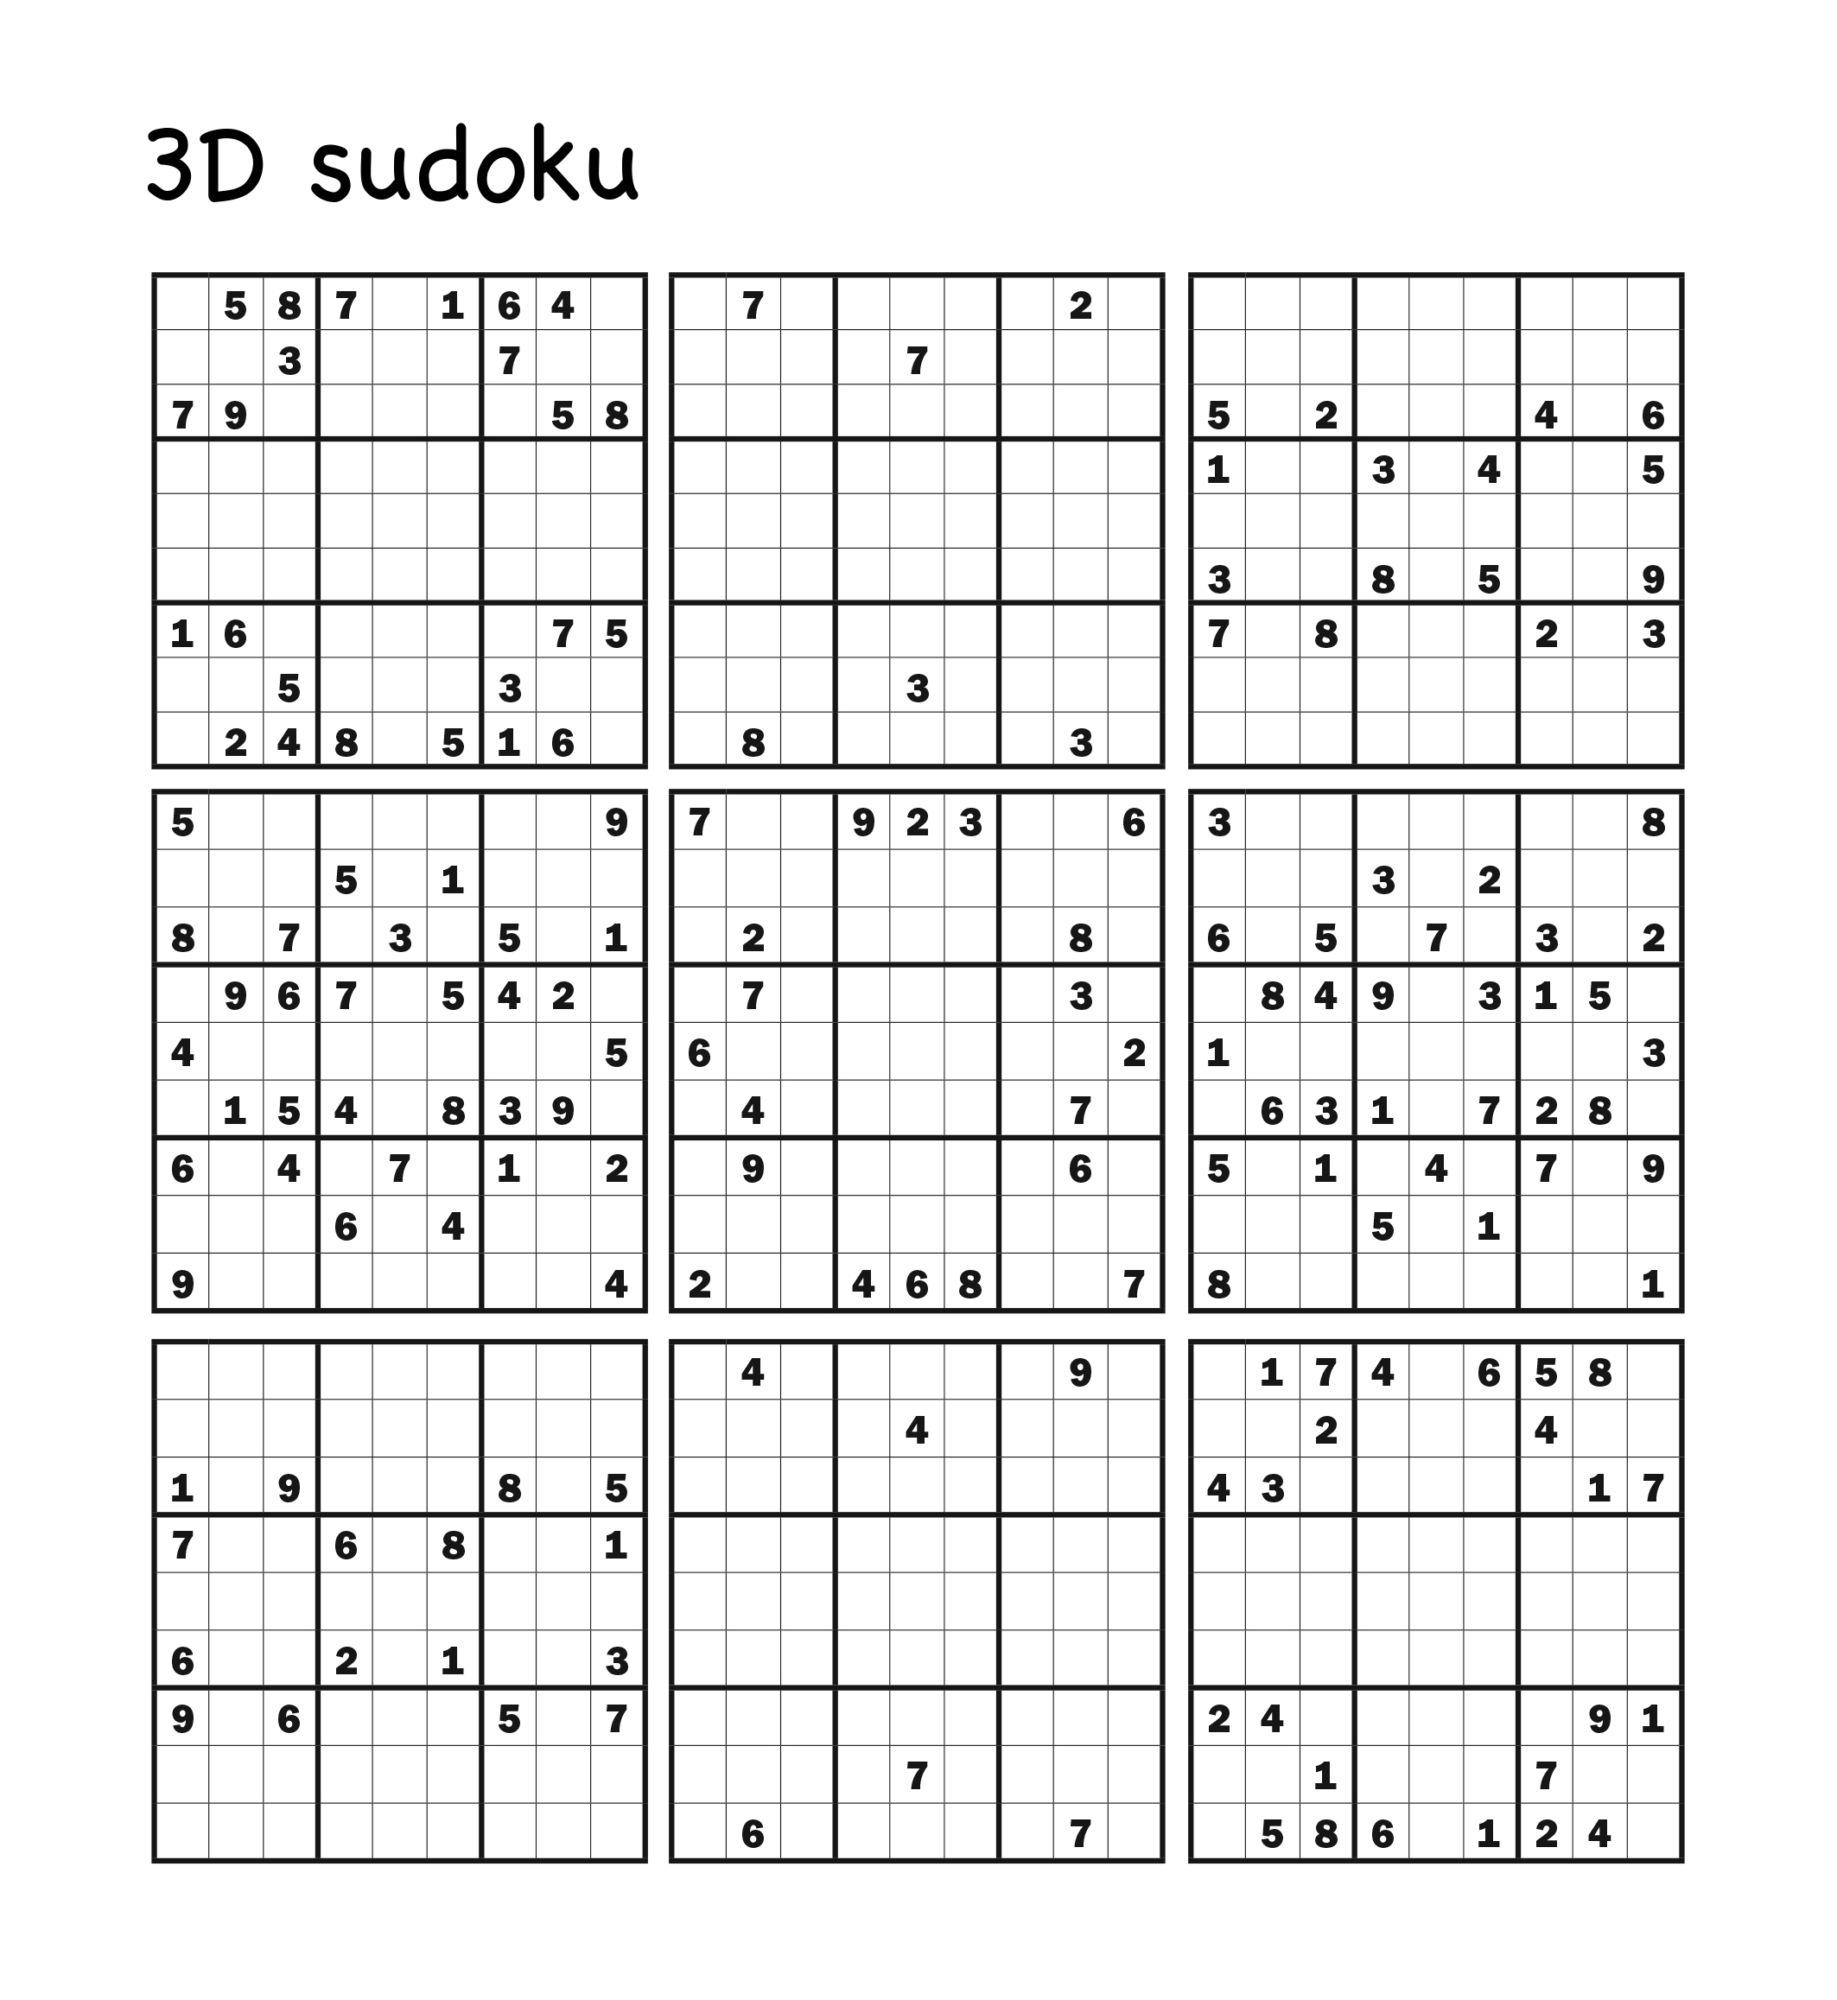 3D sudoku Turpress